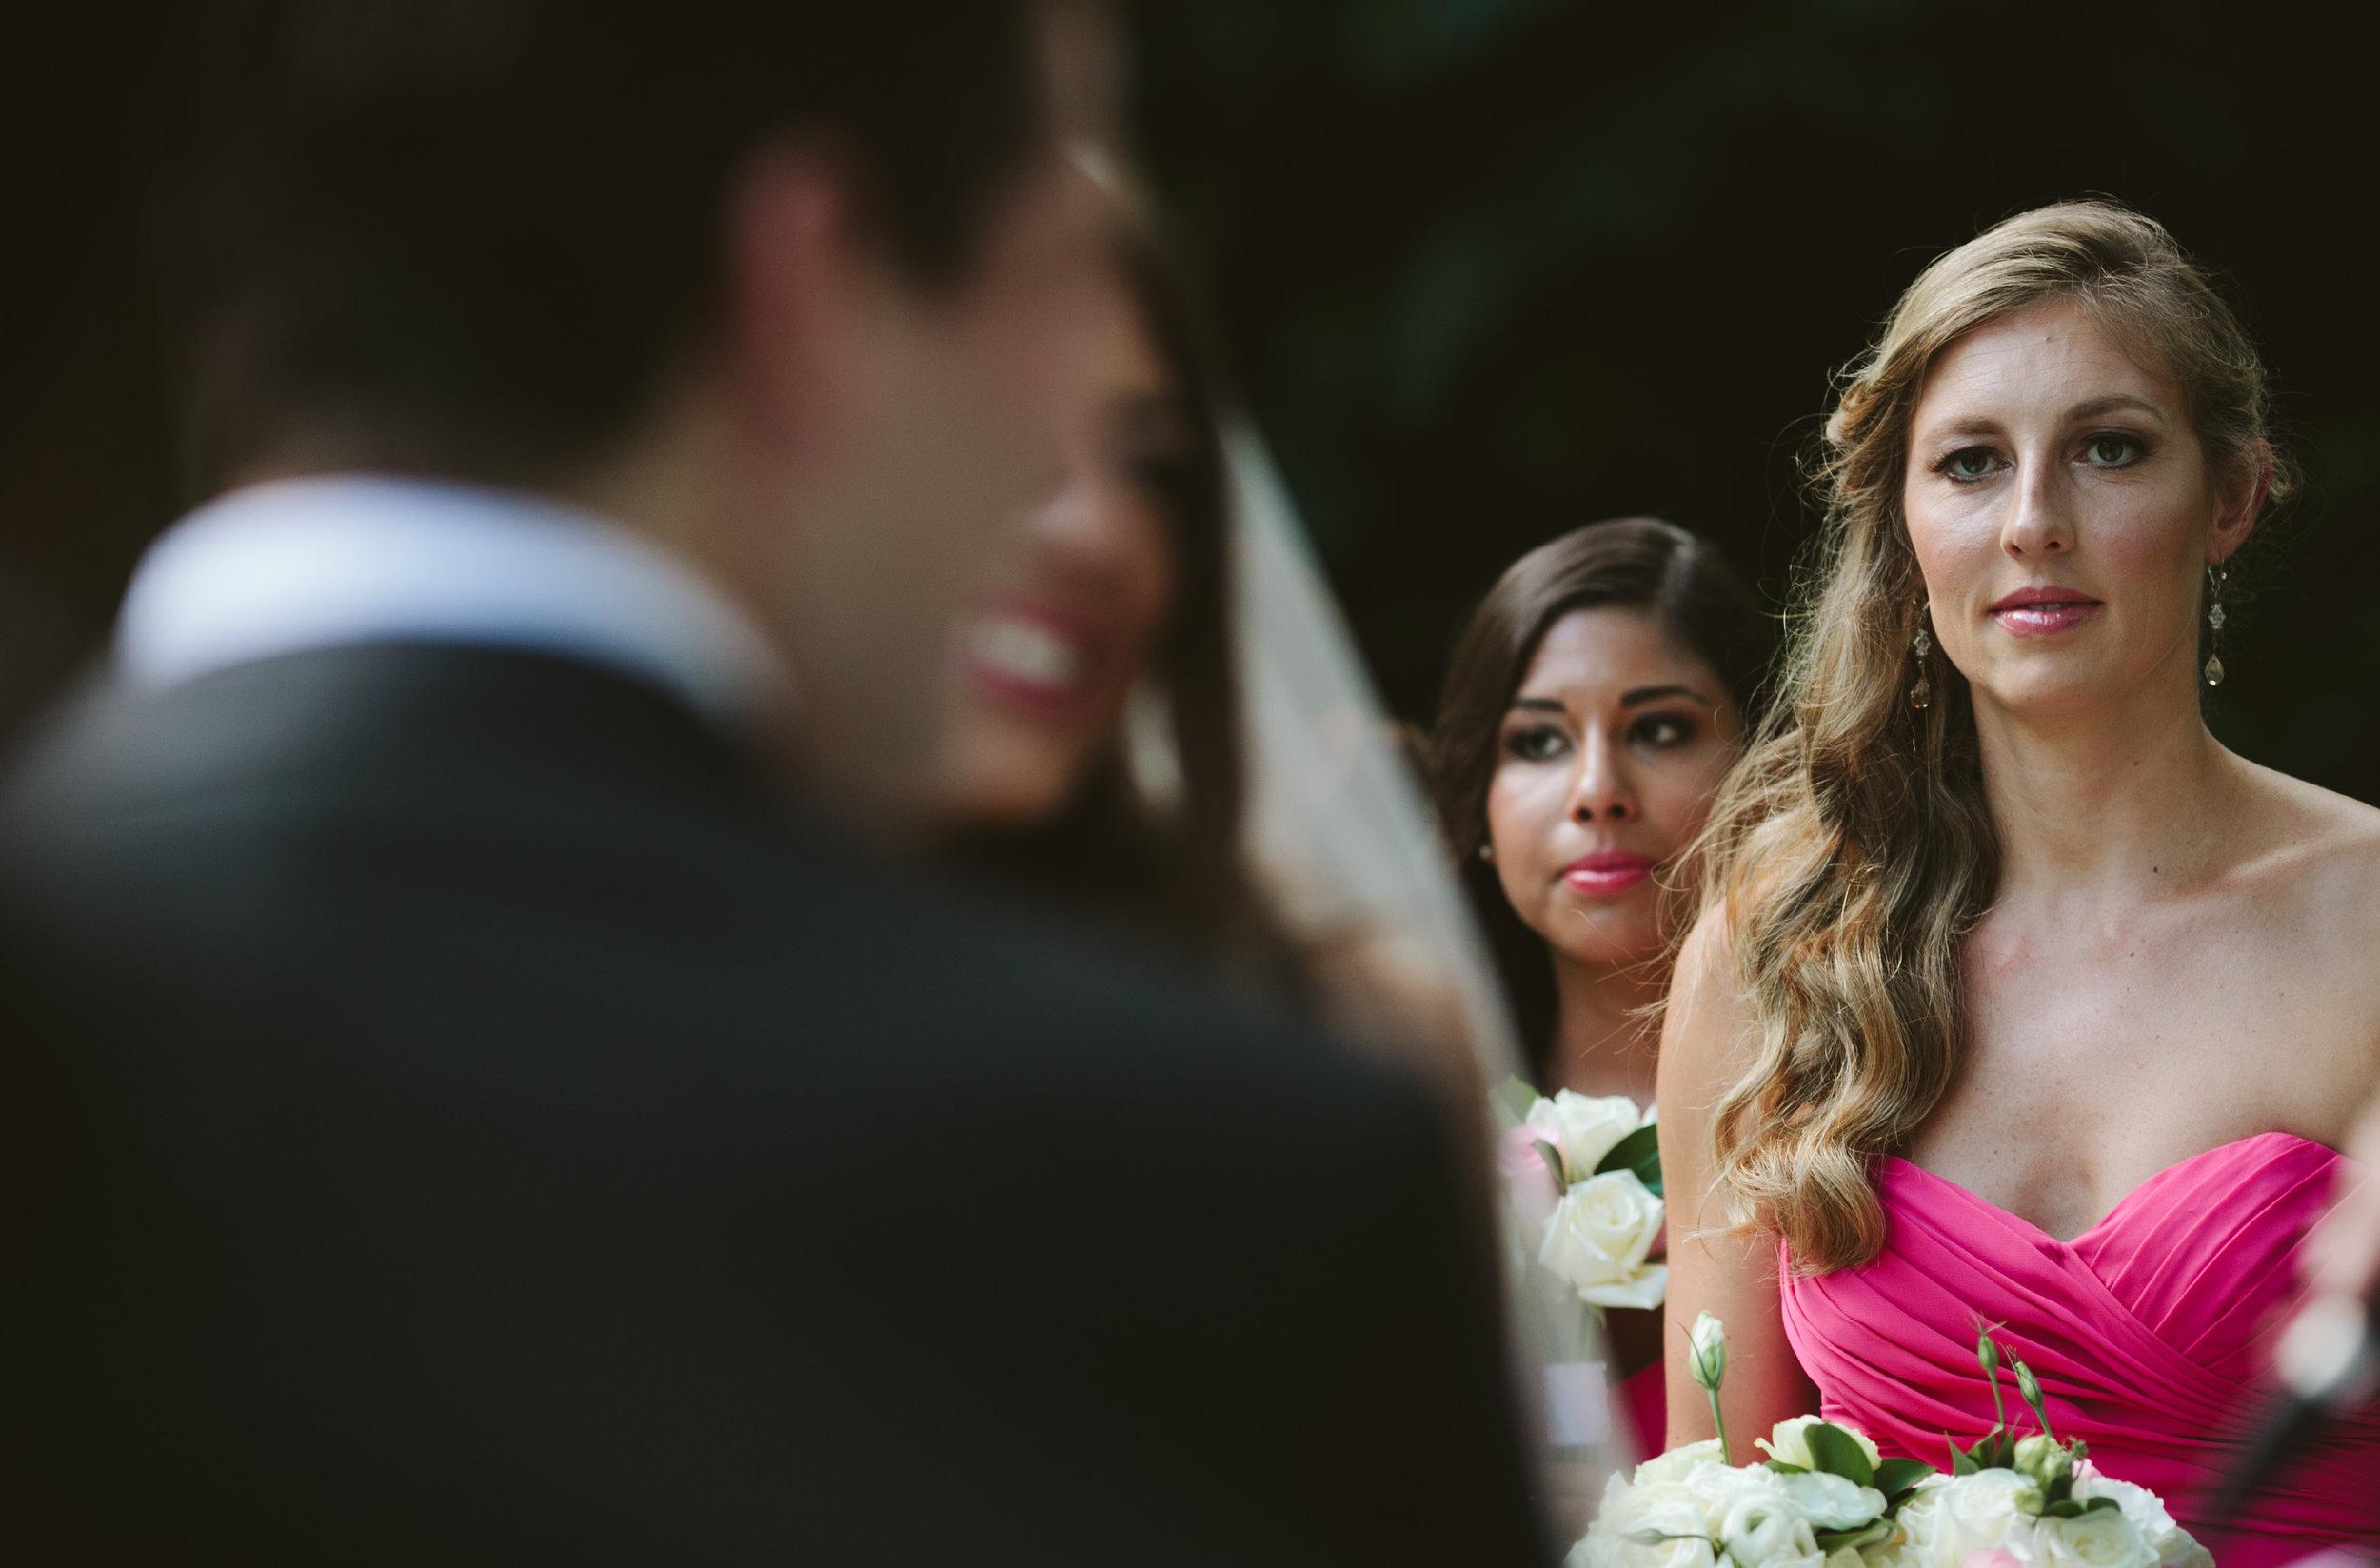 Meli + Mike Coconut Grove Wedding at Villa Woodbine52.jpg